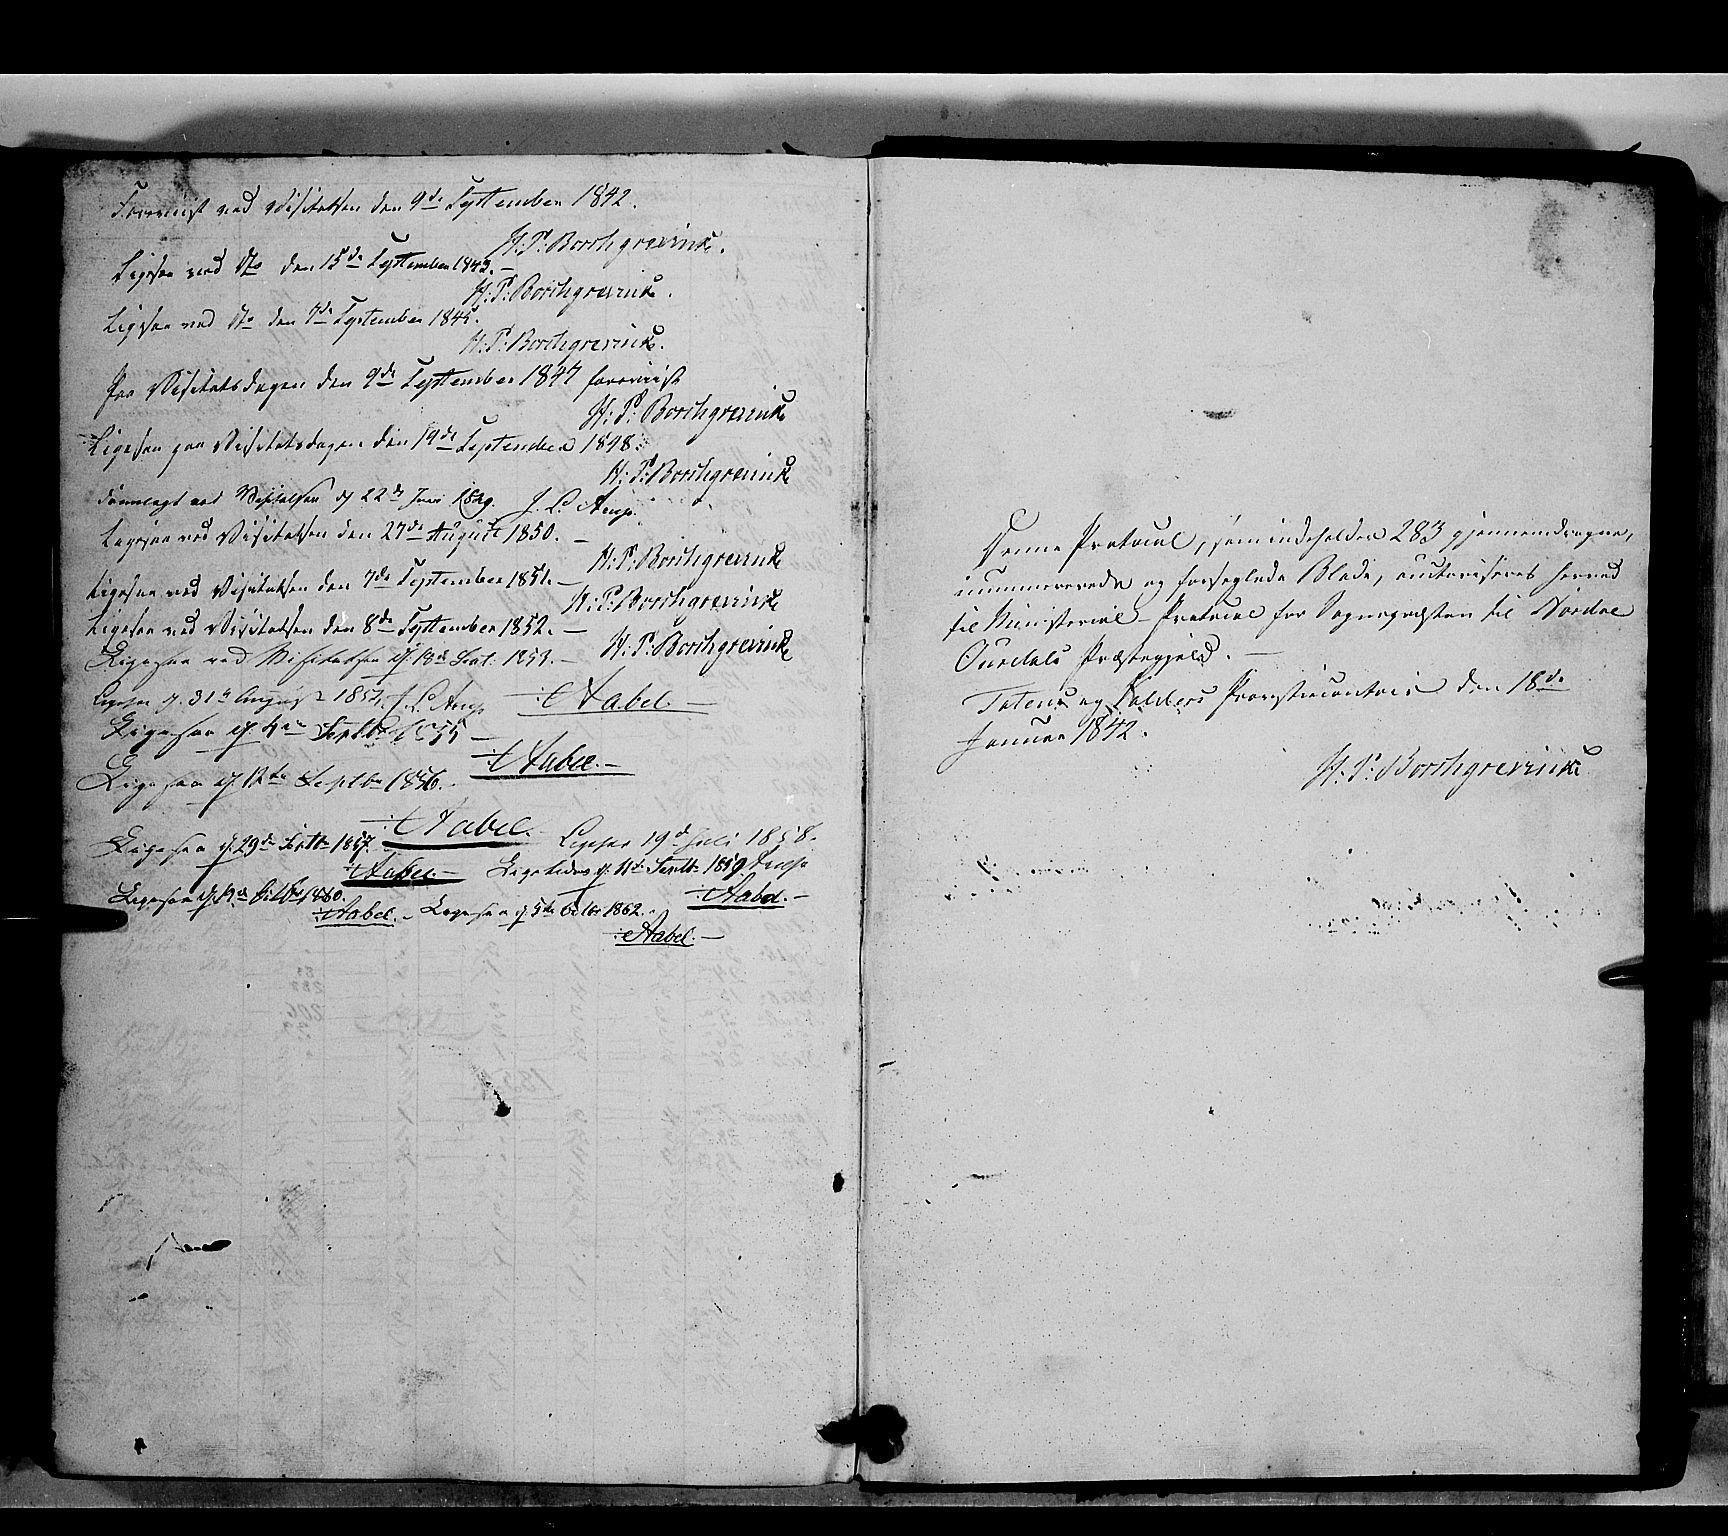 SAH, Nord-Aurdal prestekontor, Ministerialbok nr. 7, 1842-1863